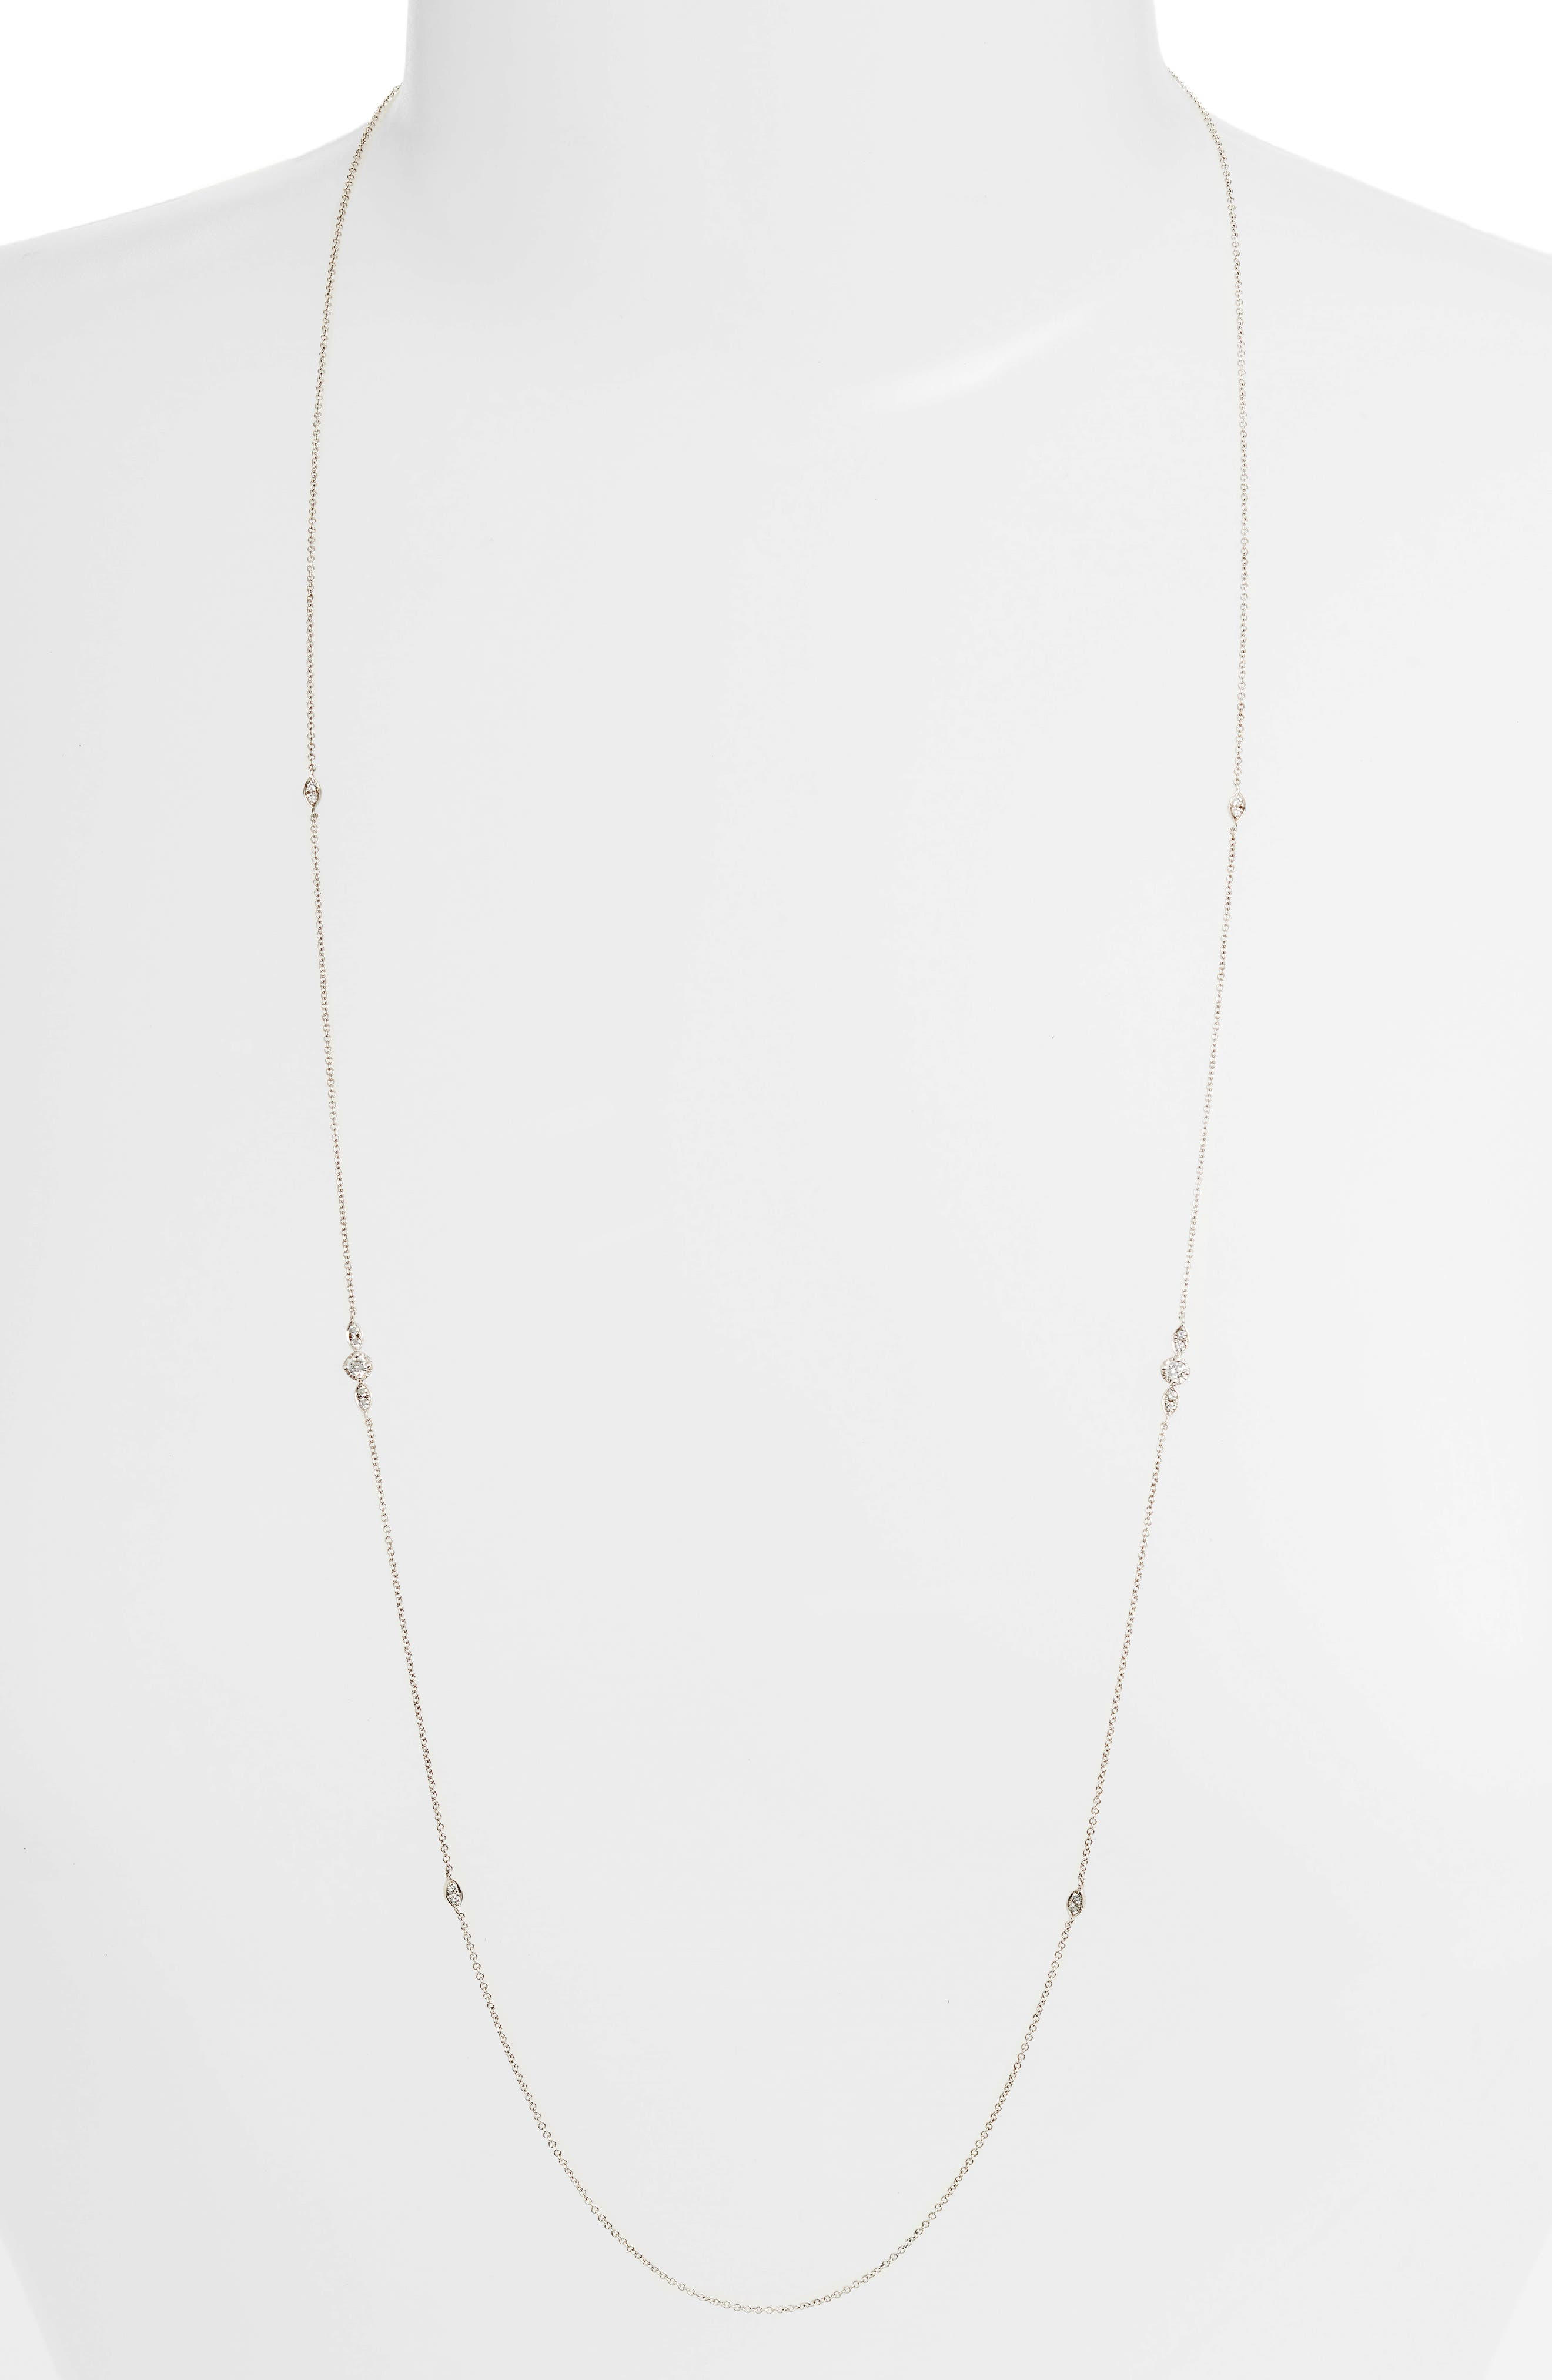 Mila Long Diamond Station Necklace,                             Main thumbnail 1, color,                             White Gold